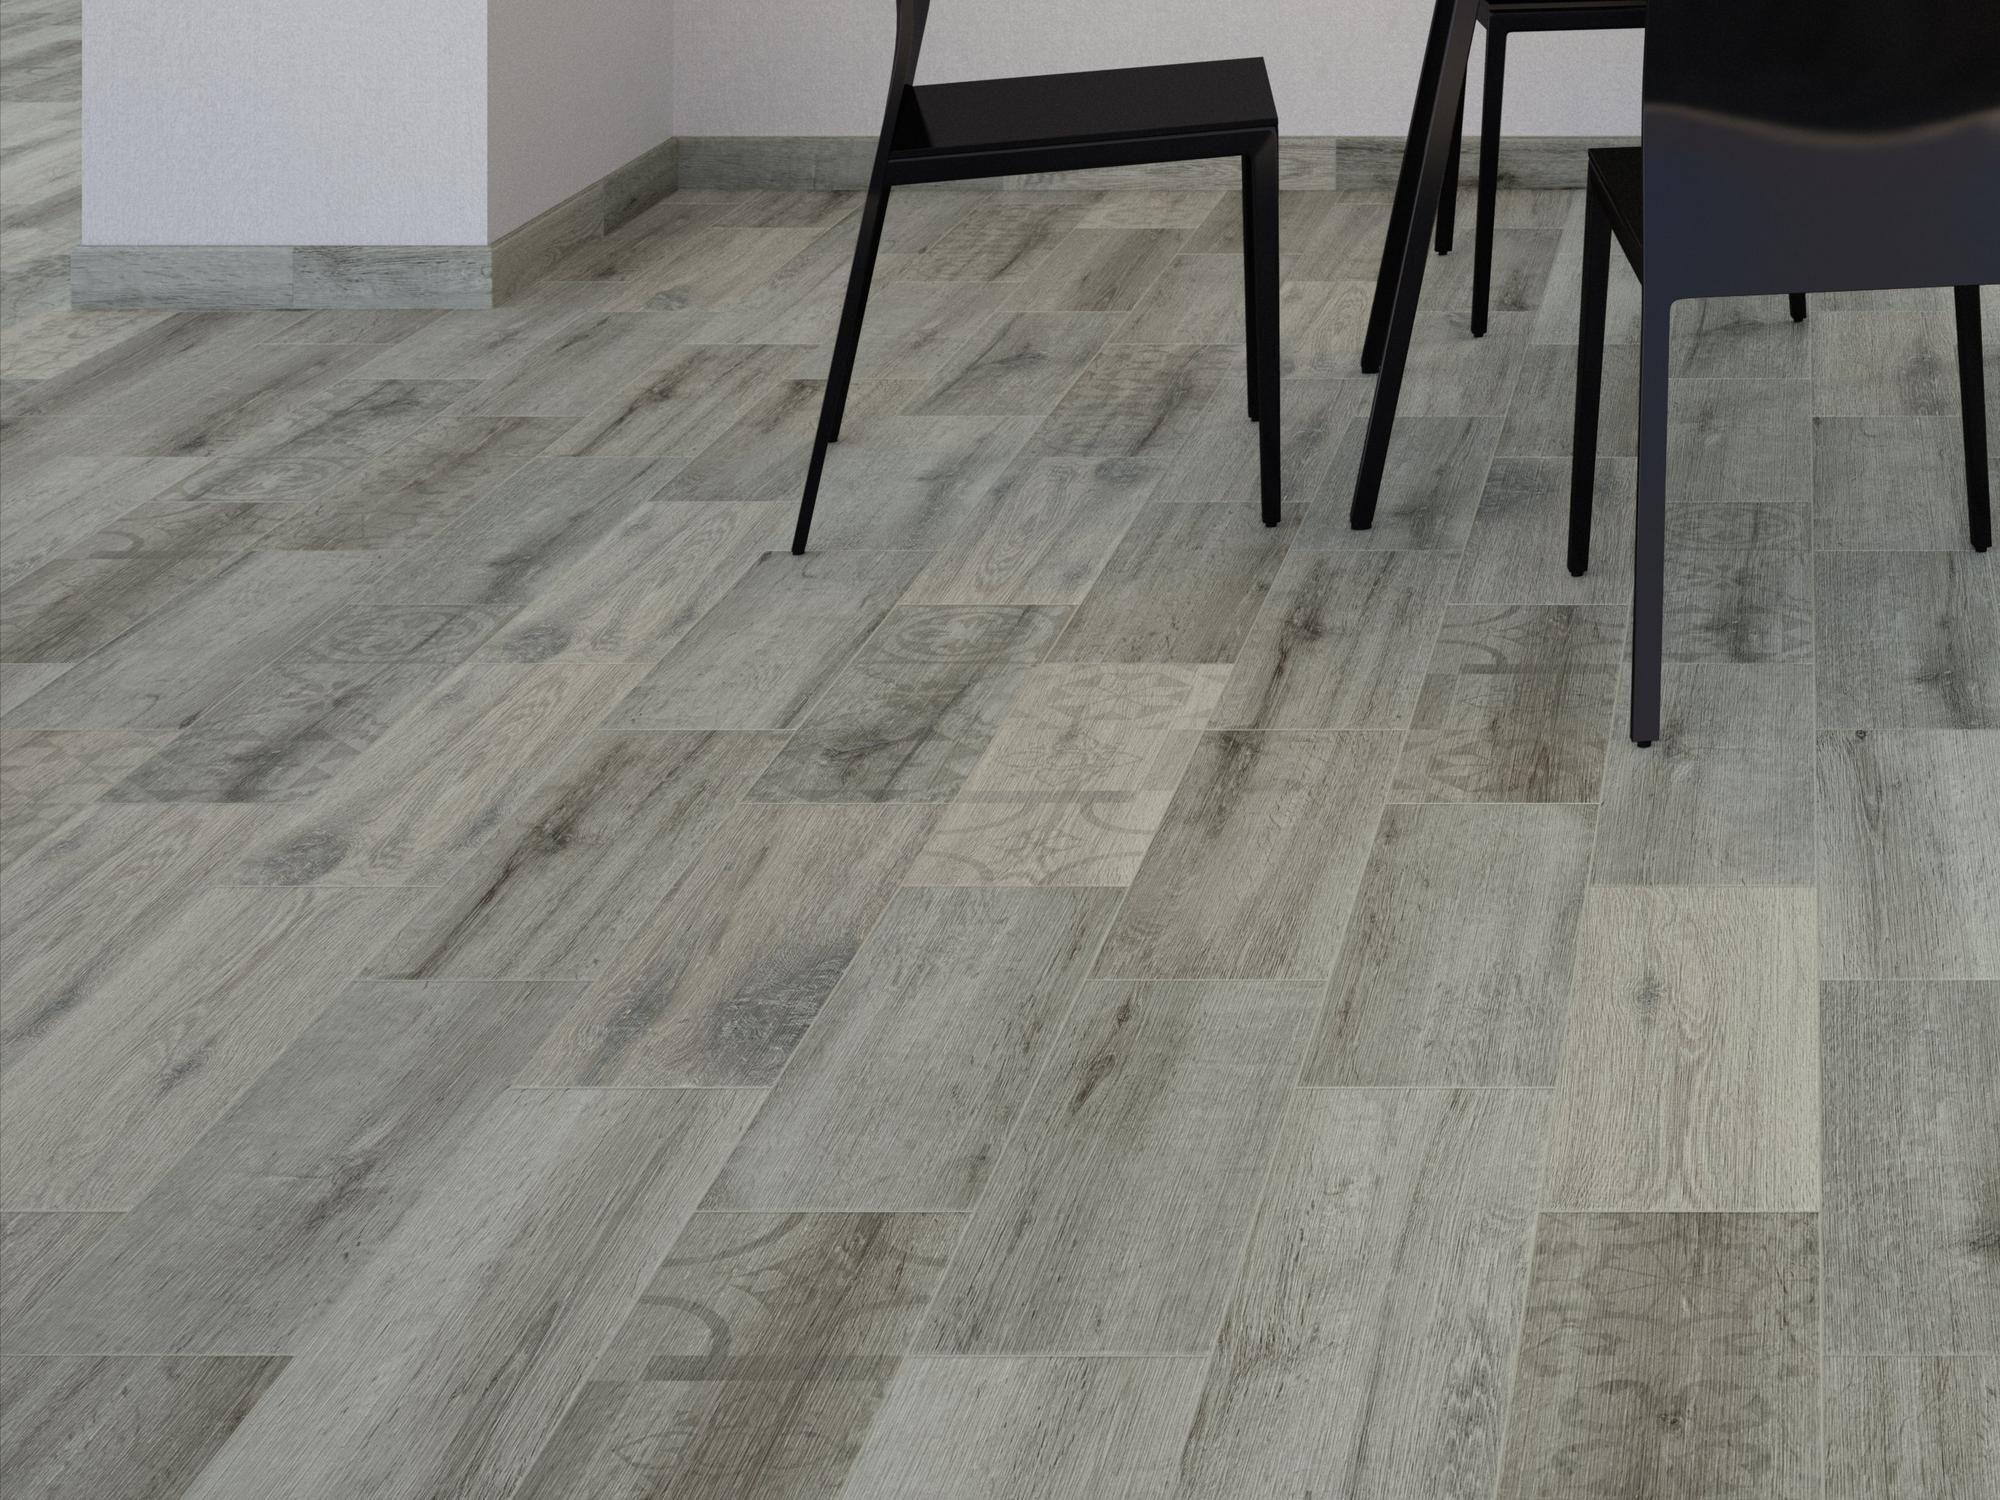 Kivu Ceniza Wood Plank Ceramic Tile Floor Decor Wood Planks Ceramic Floor Tiles Wood Look Tile